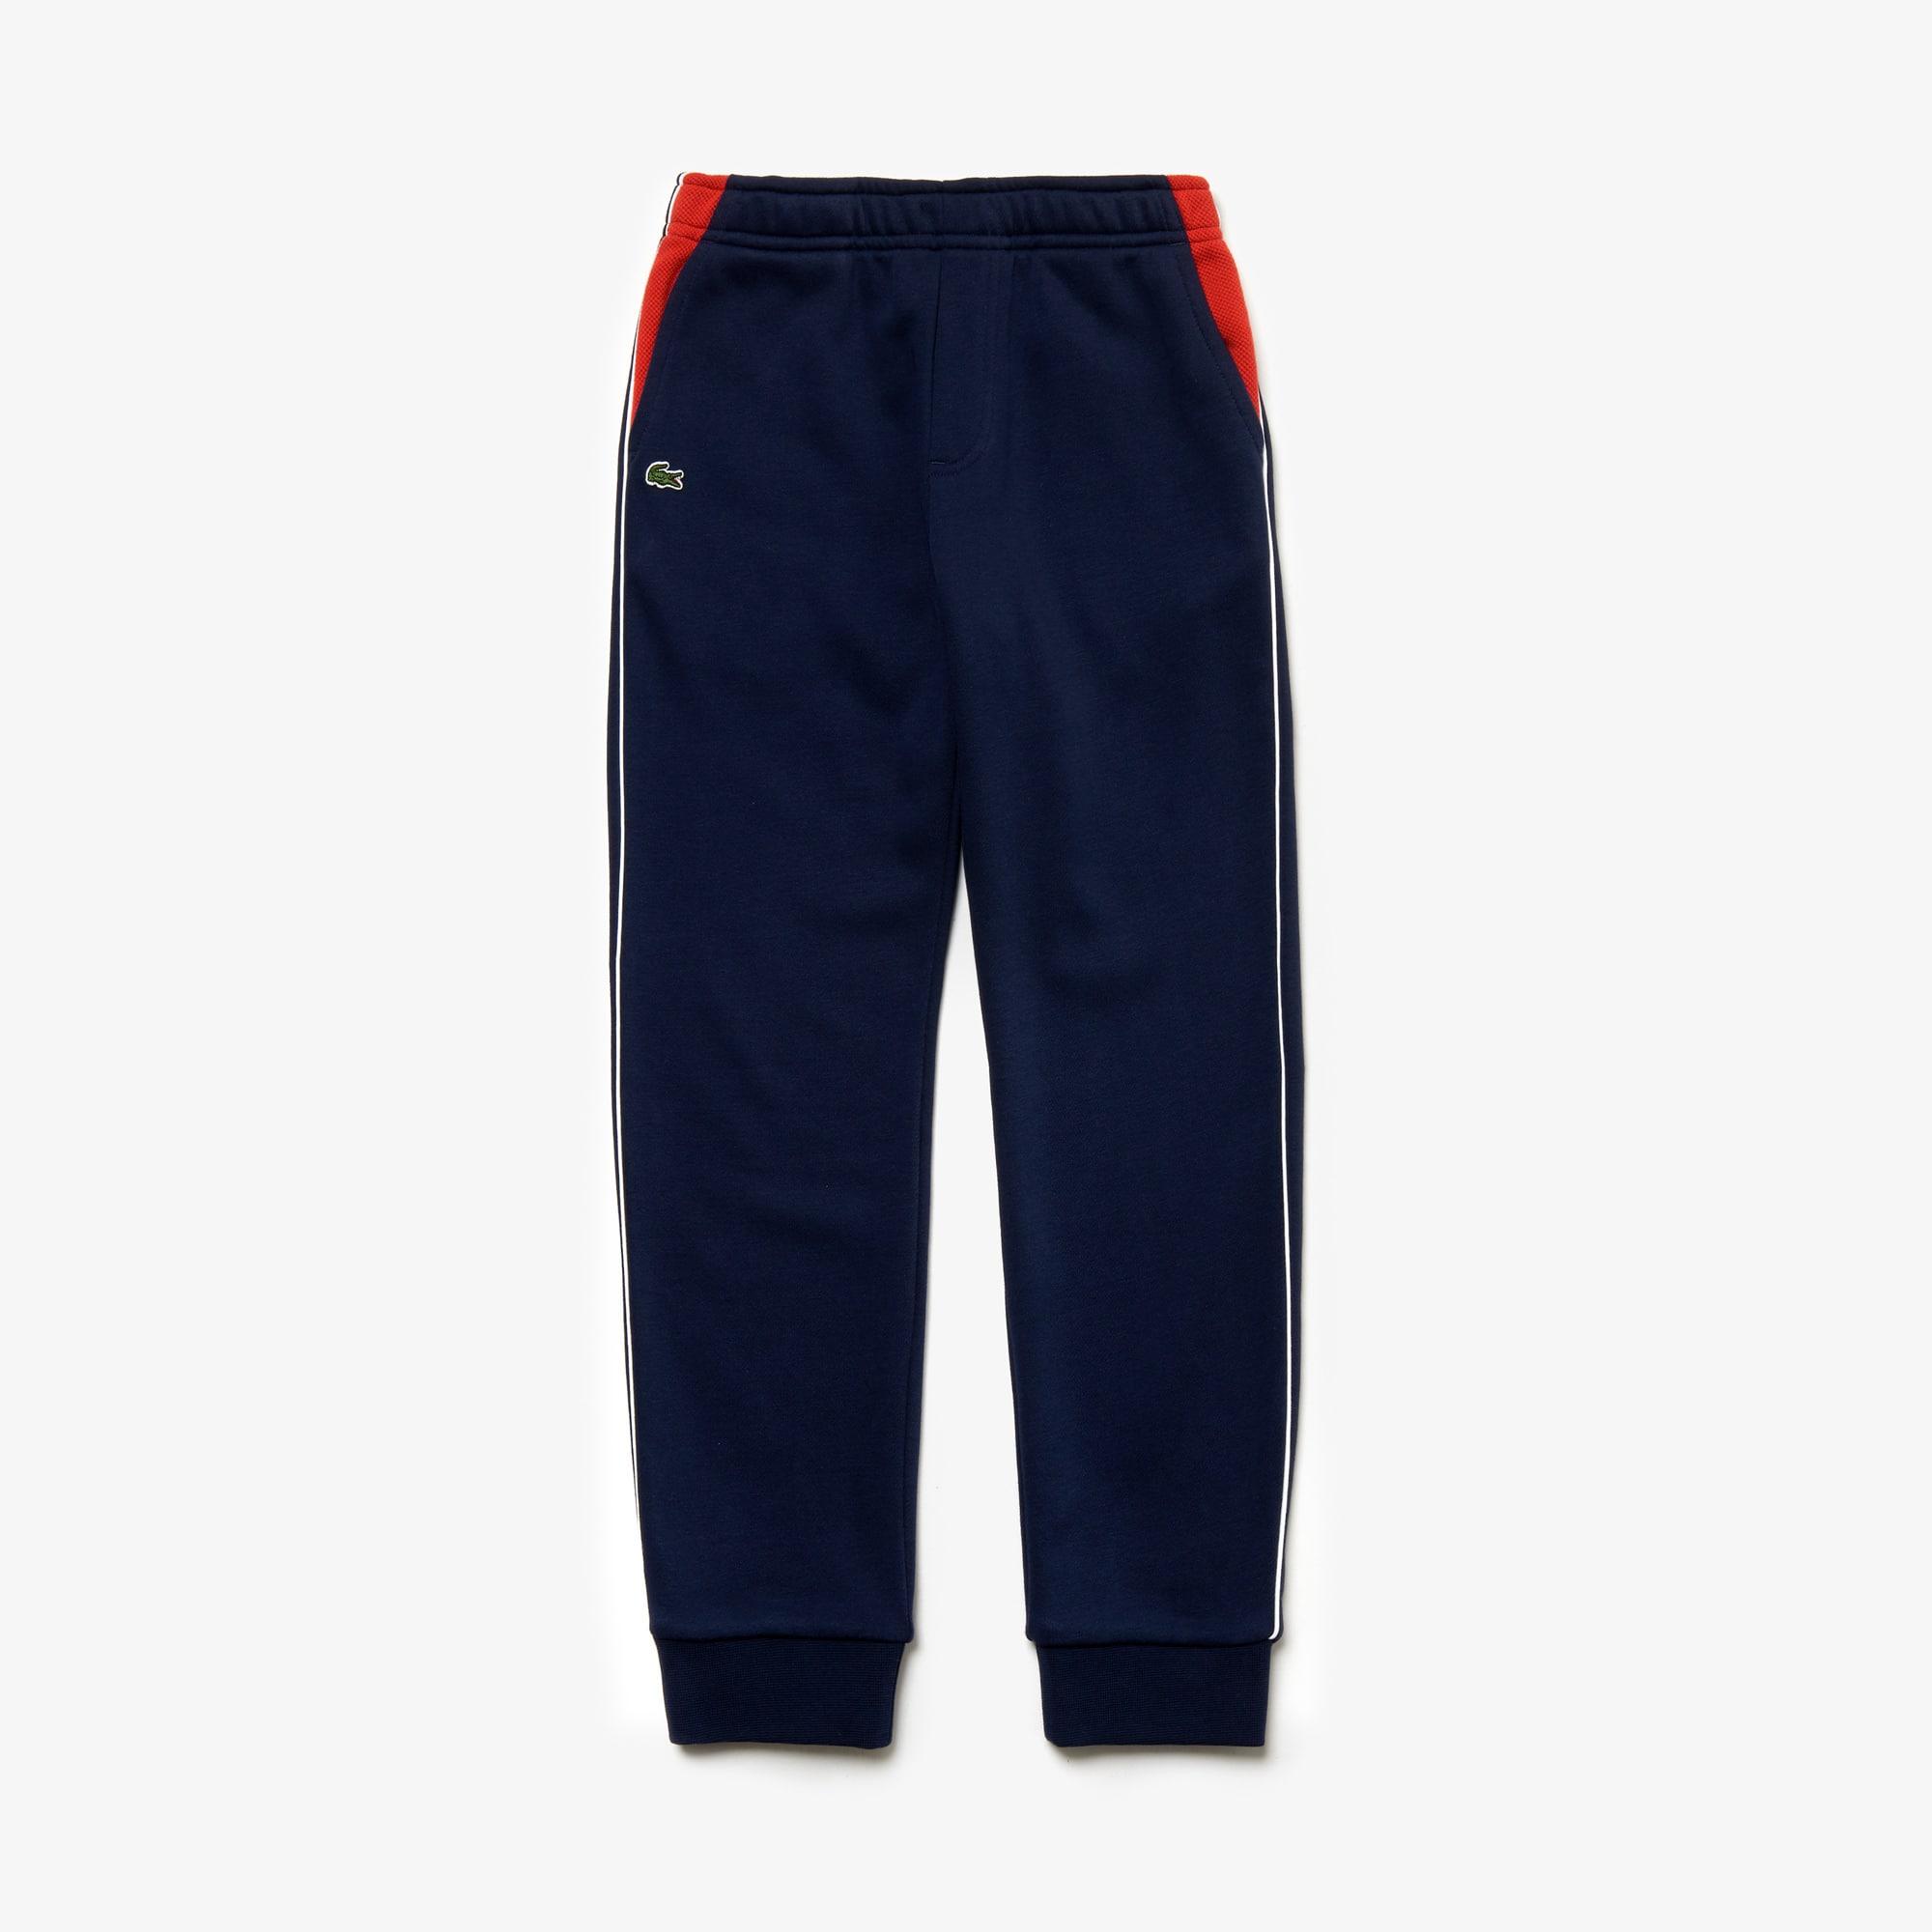 4dc03e5b7f Pantalon & Short Garçon   Vêtements Enfant   LACOSTE